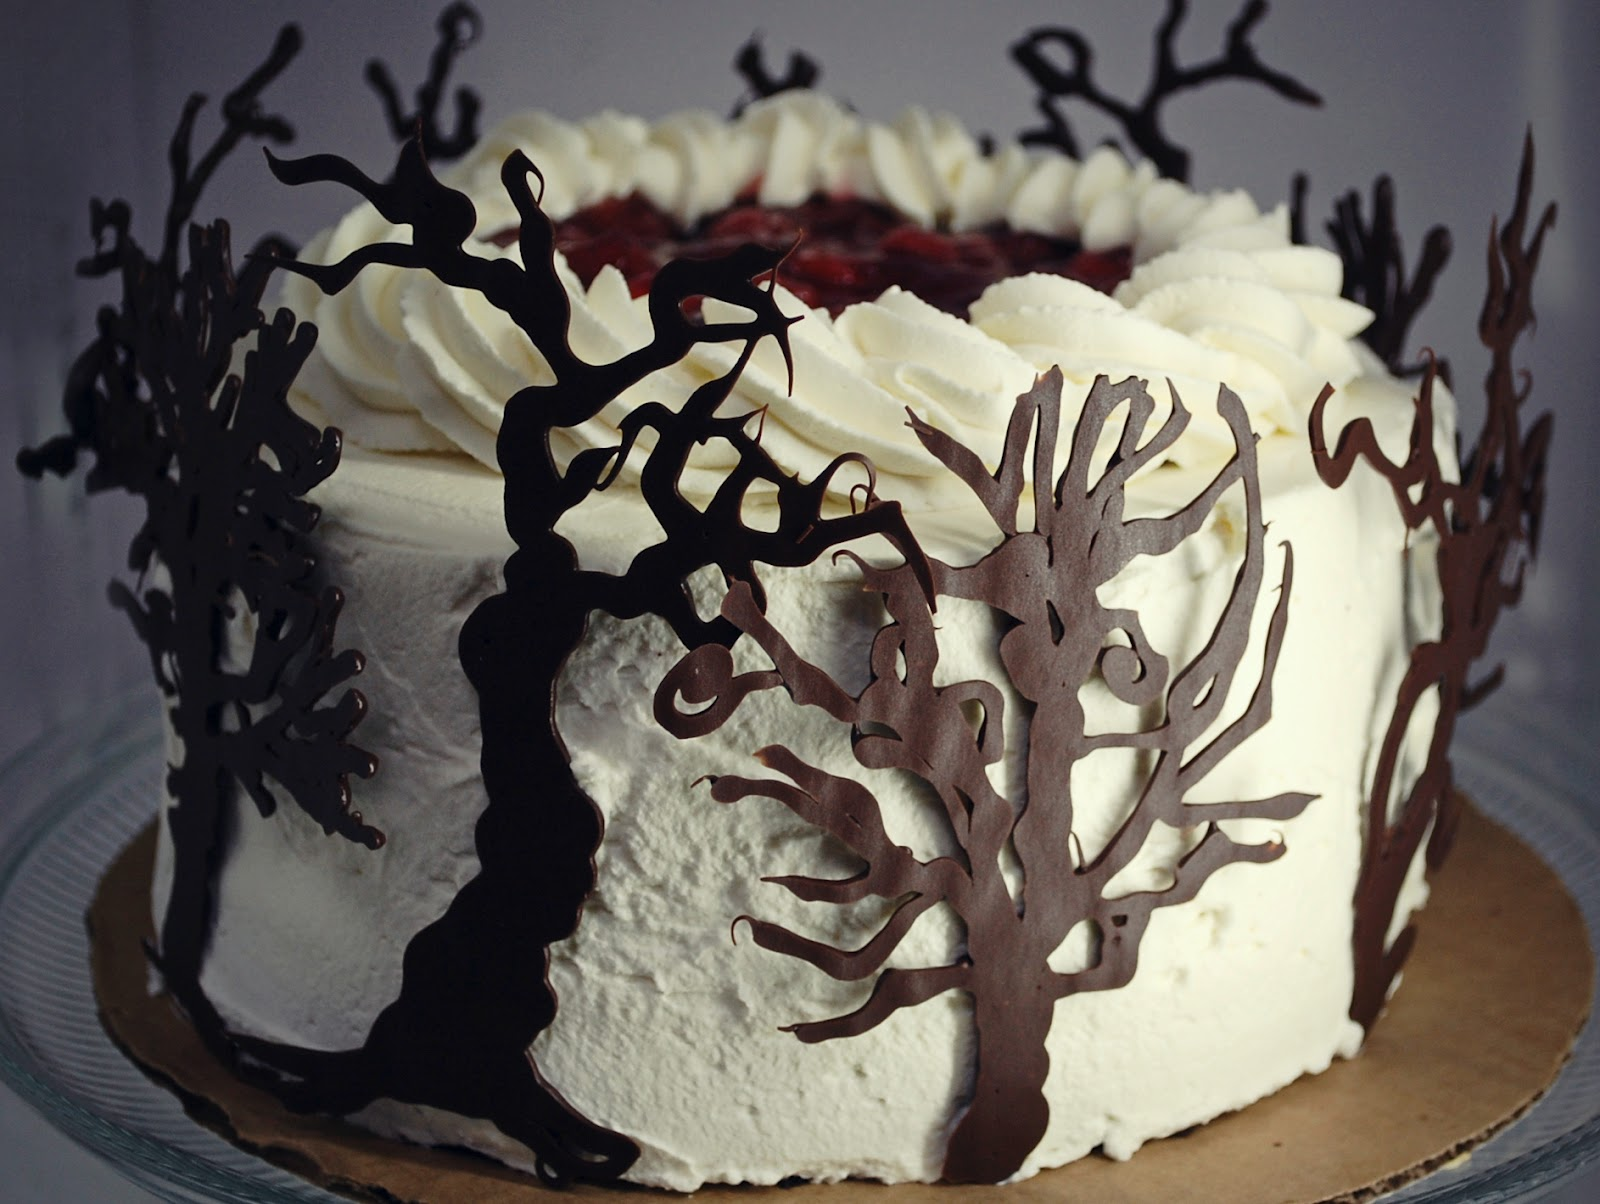 Best Black Forest Cake Recipe